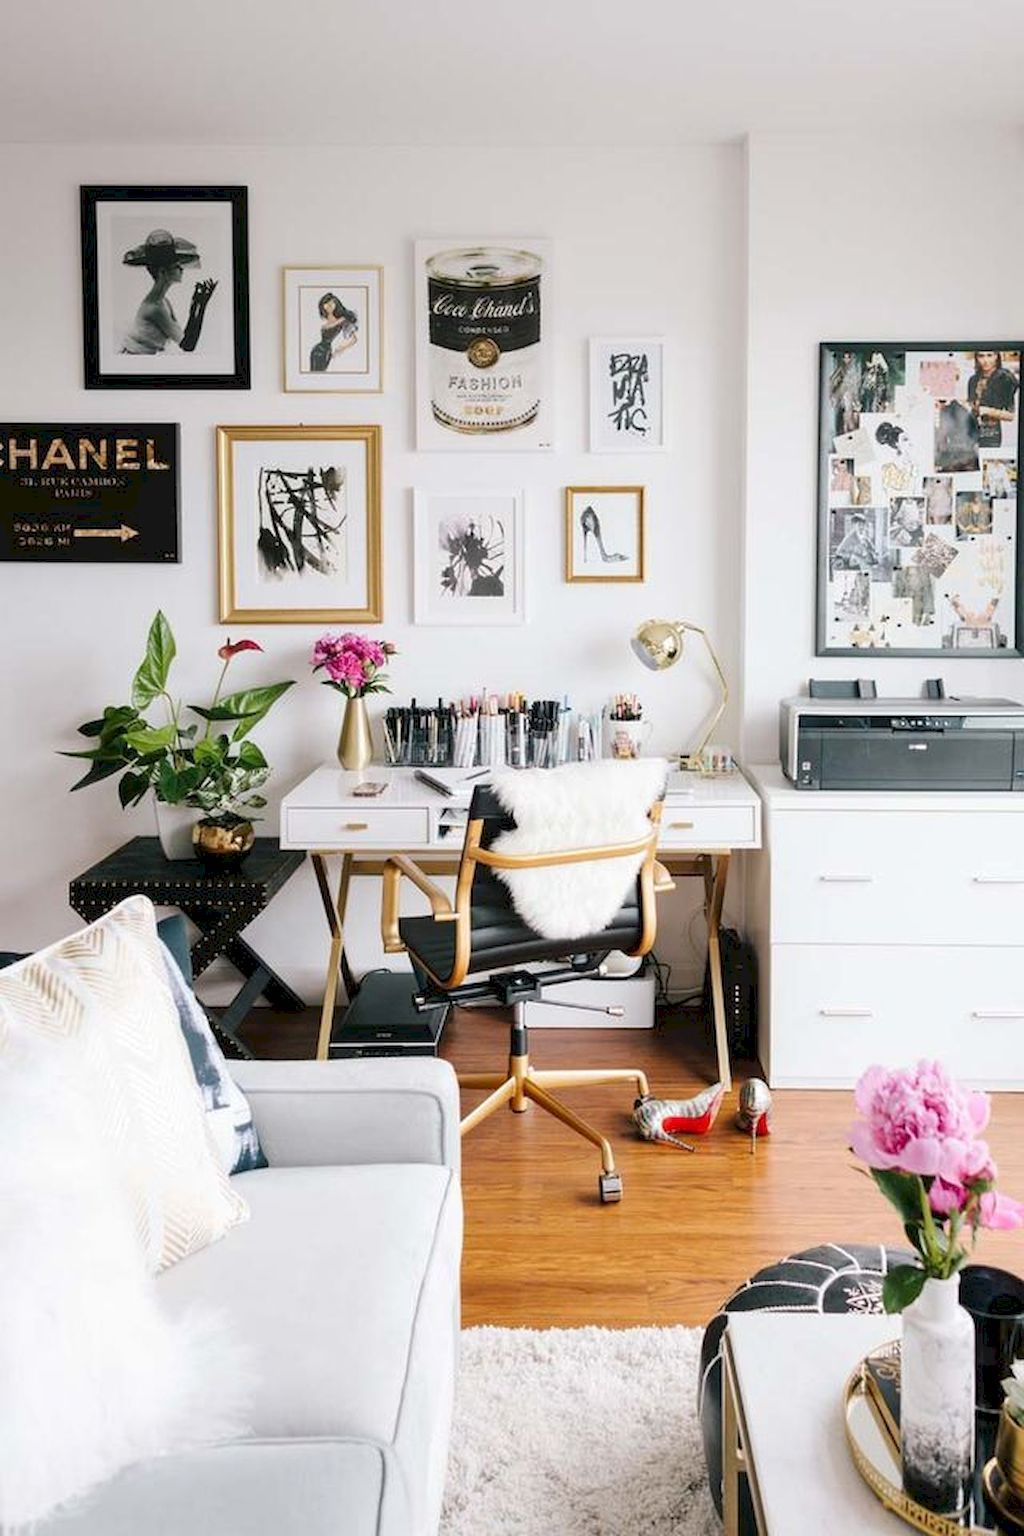 Studio Apartment Decorating Ideas On A Budget 10